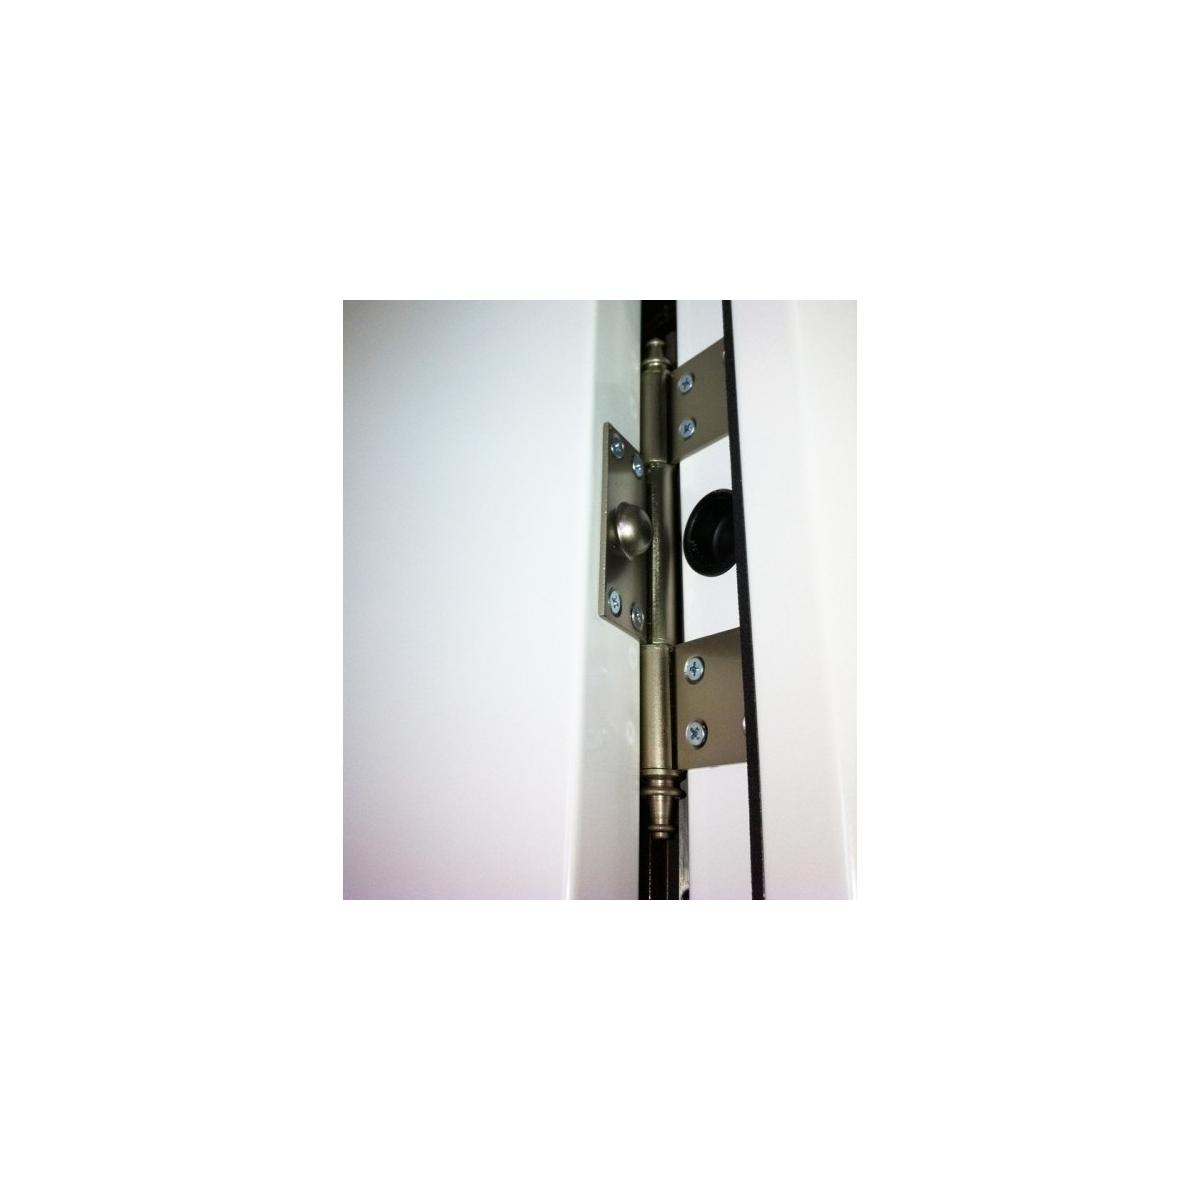 Puerta acorazada Antique 2 Glass Puertas acorazadas Serie B4-BL